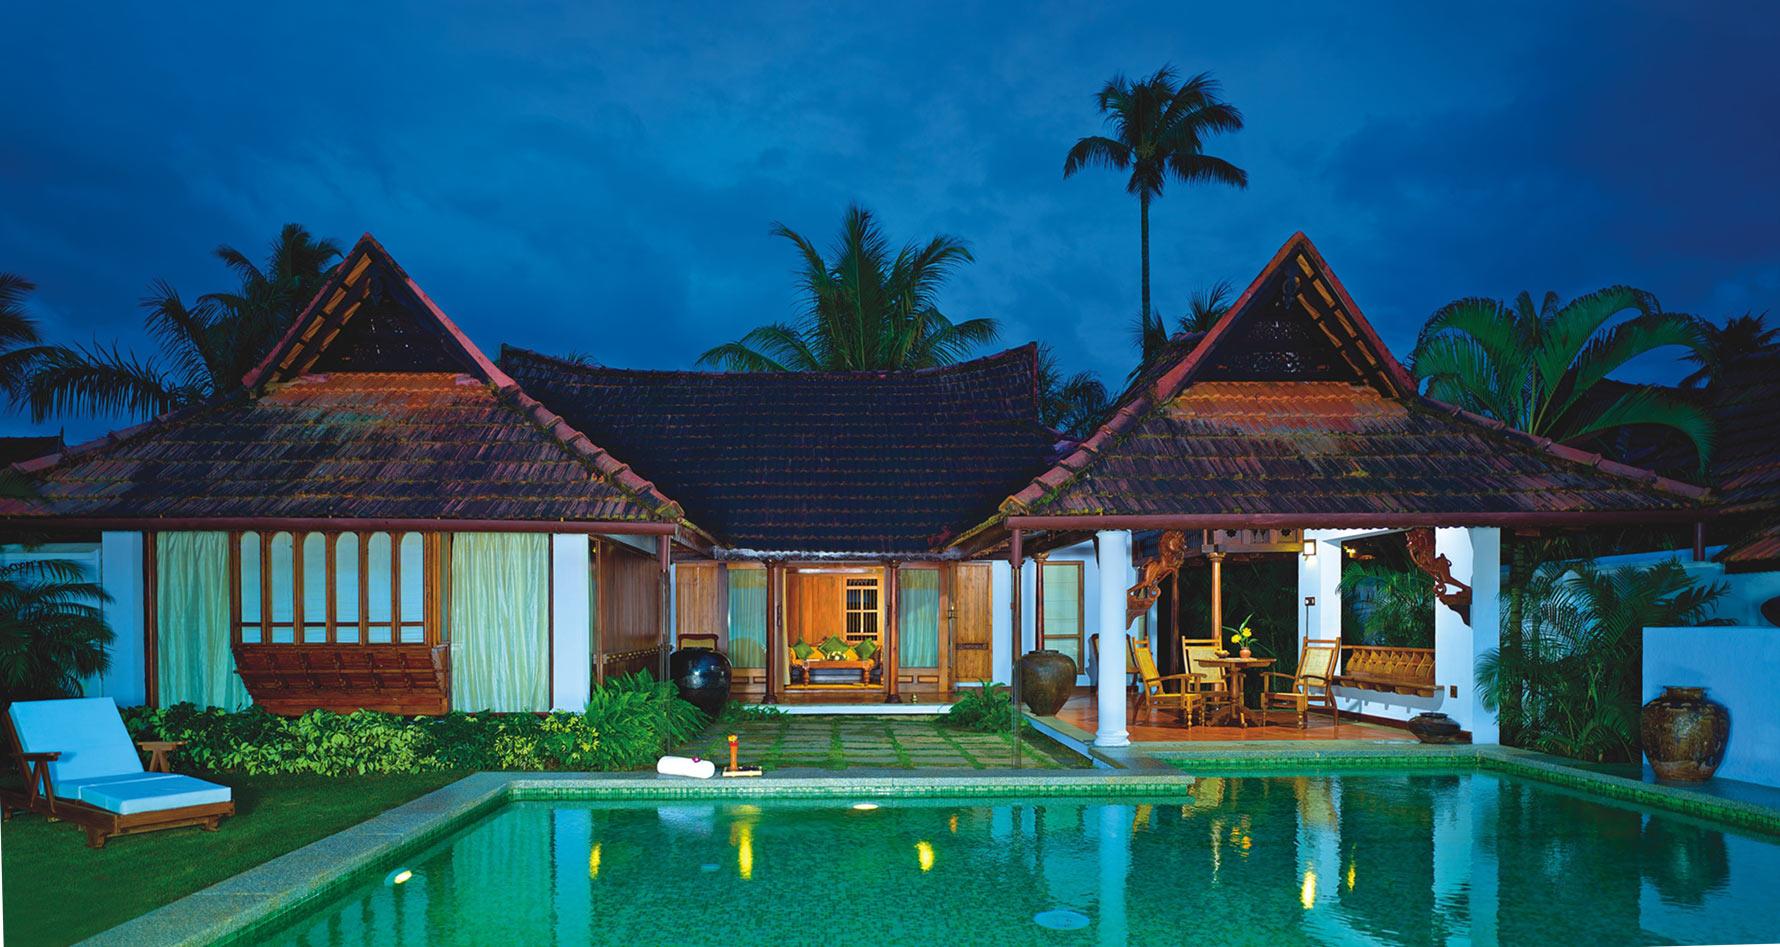 Kerala 5 Star Hotels And Resorts Newatvs Info